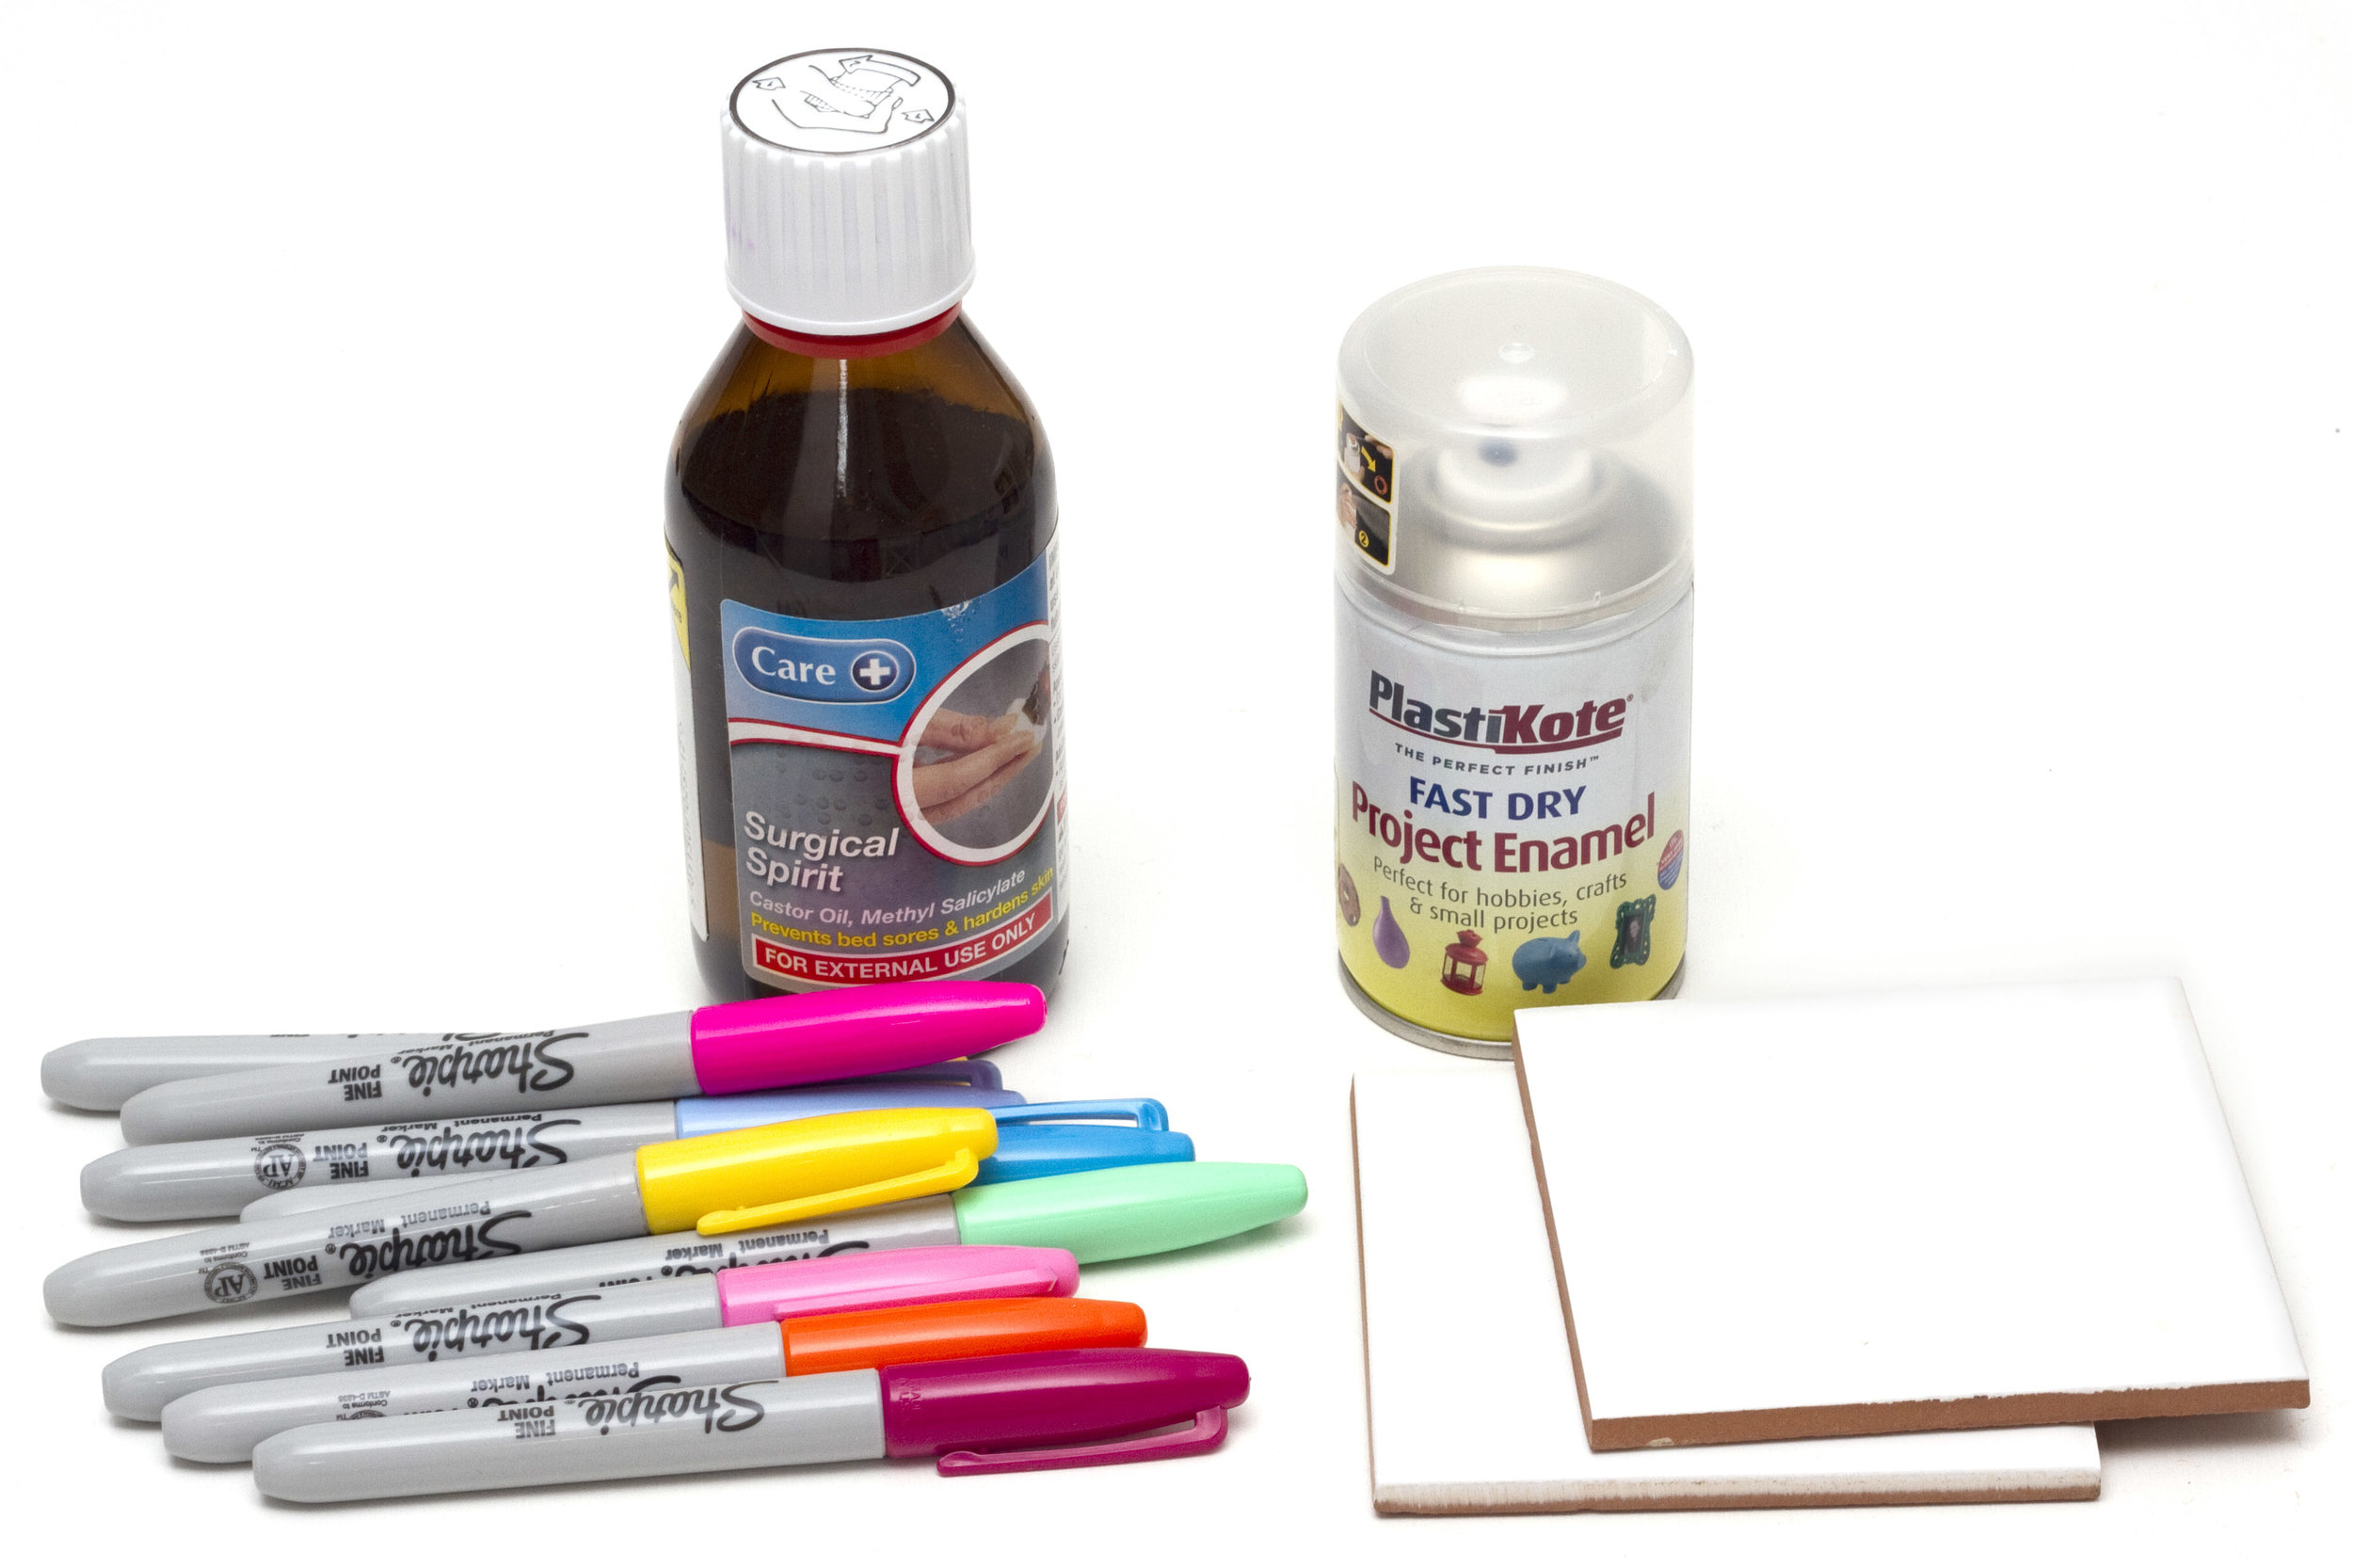 You will need: Sharpie pen markers Tiles (approx. 10cm x 10cm) Surgical Spirit (or alcohol) Varnish Felt Gluegun Scissors White paint